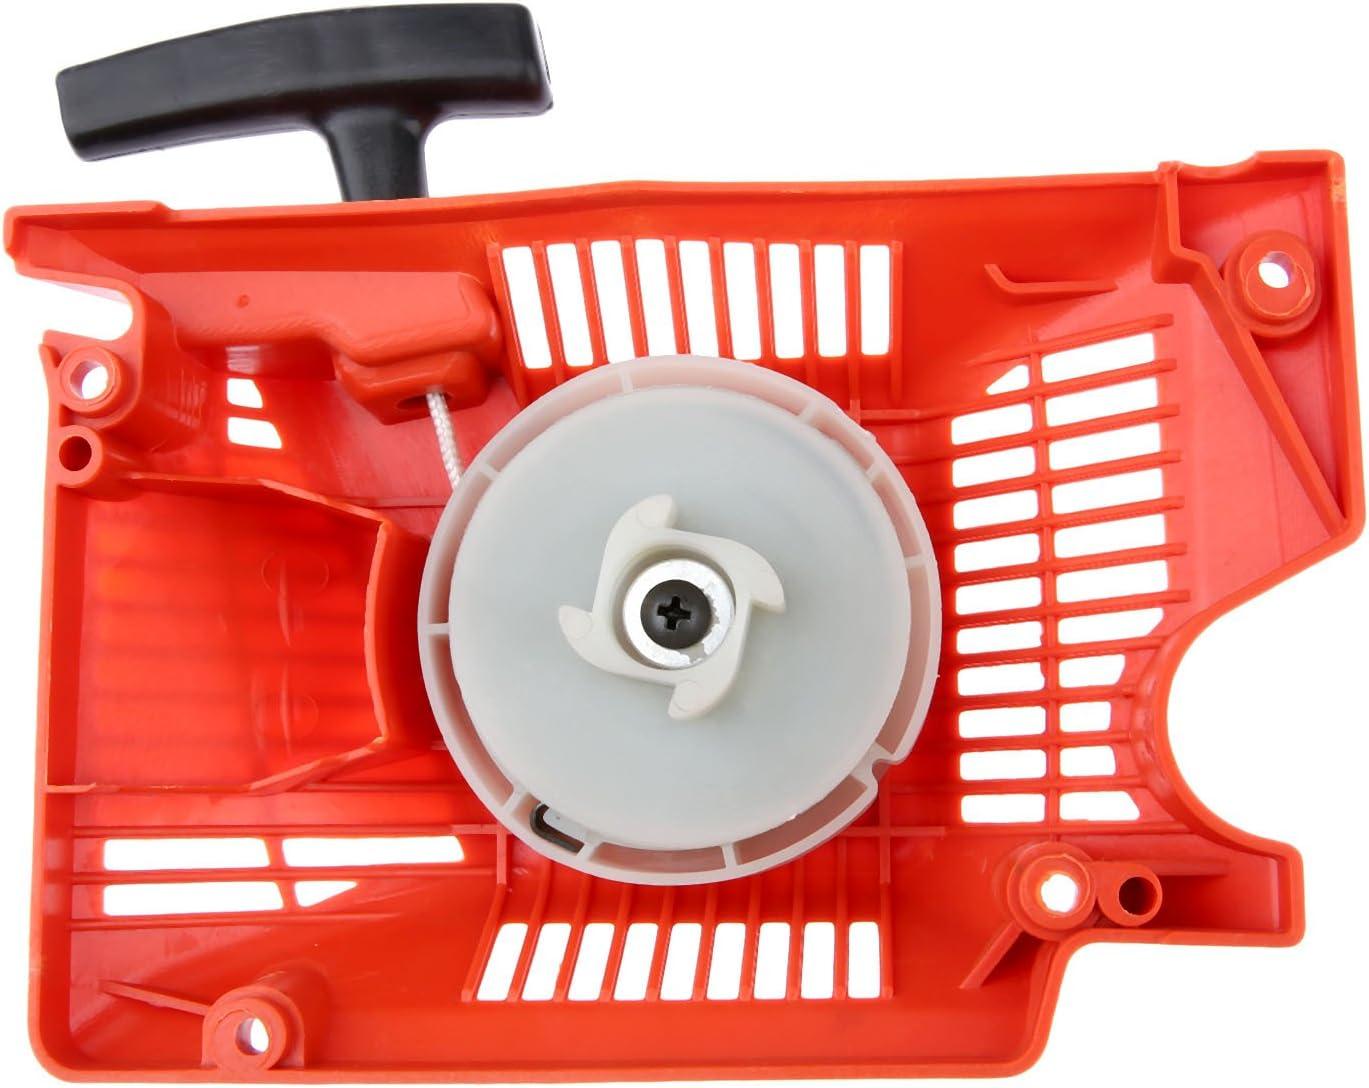 Bowarepro - Conjunto de Arranque de Retroceso único para Motosierra China 4500 5200 5800 CC, 52 CC, 58 CC, Motosierra, arrancador para Motosierra China 4500 5200 5800 Rojo